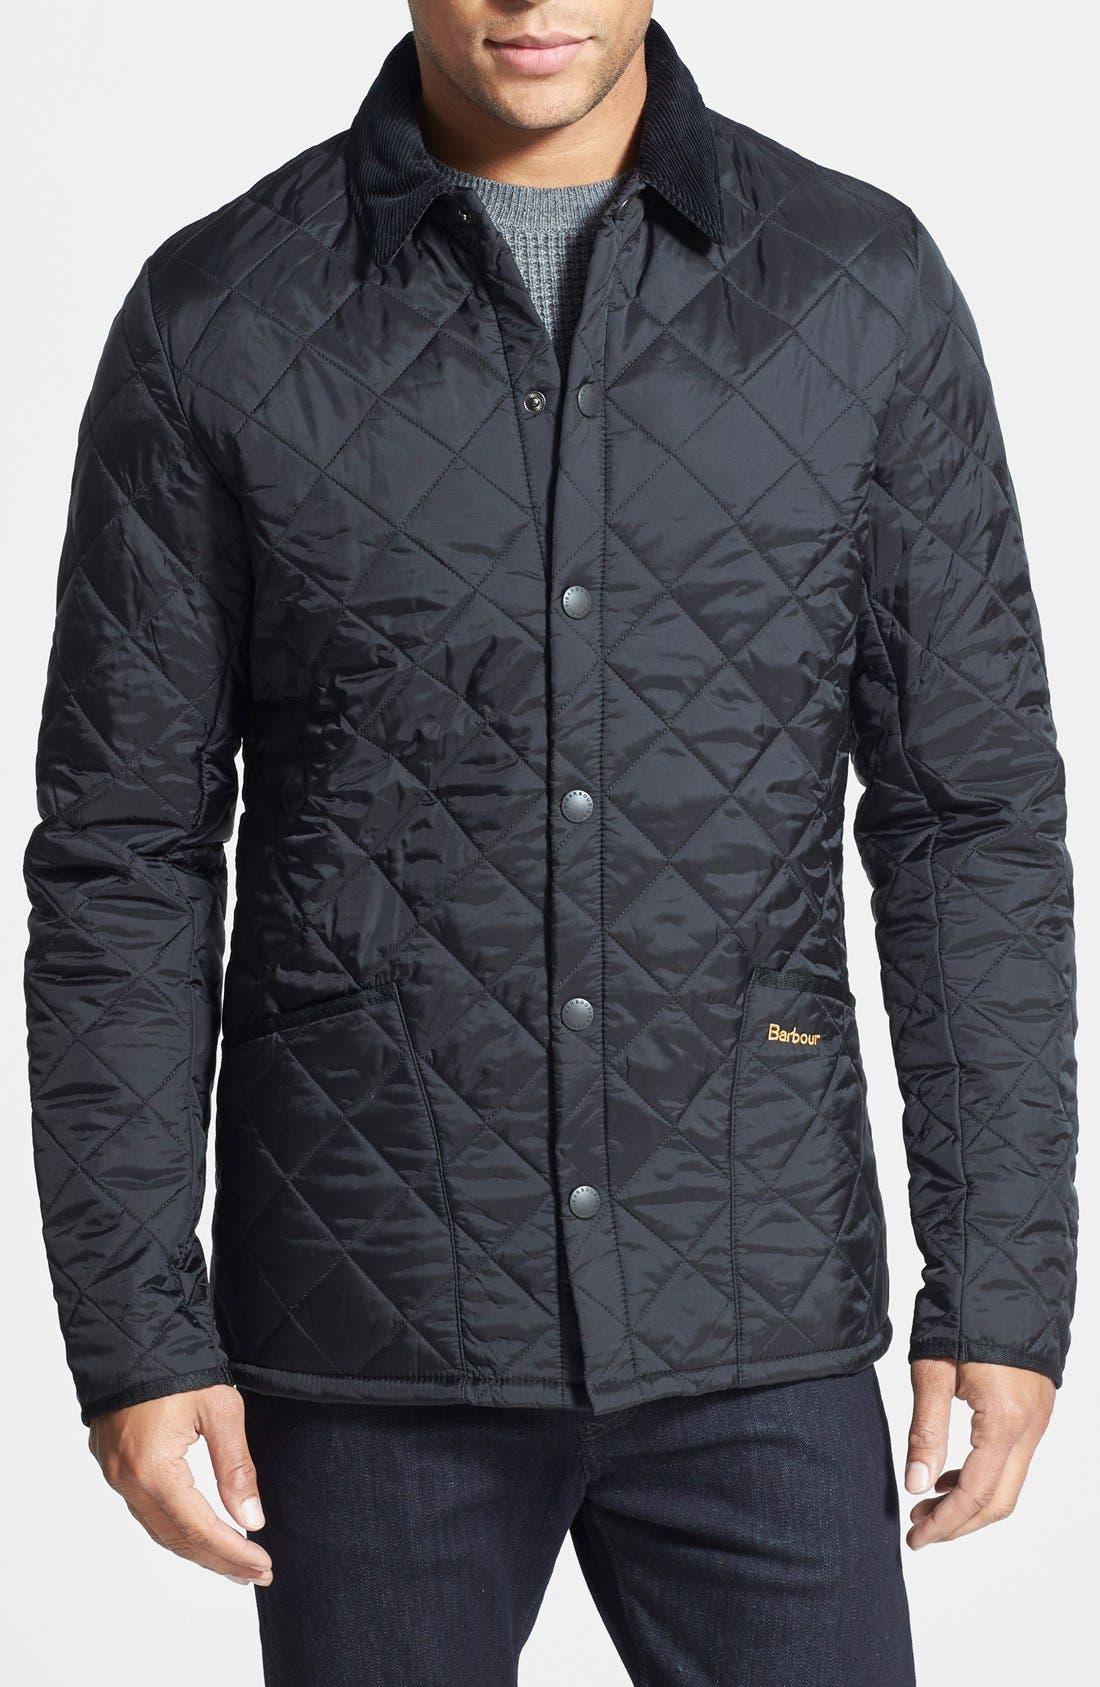 Men's Quilted & Puffer Coats & Men's Quilted & Puffer Jackets ... : mens lightweight quilted jacket - Adamdwight.com